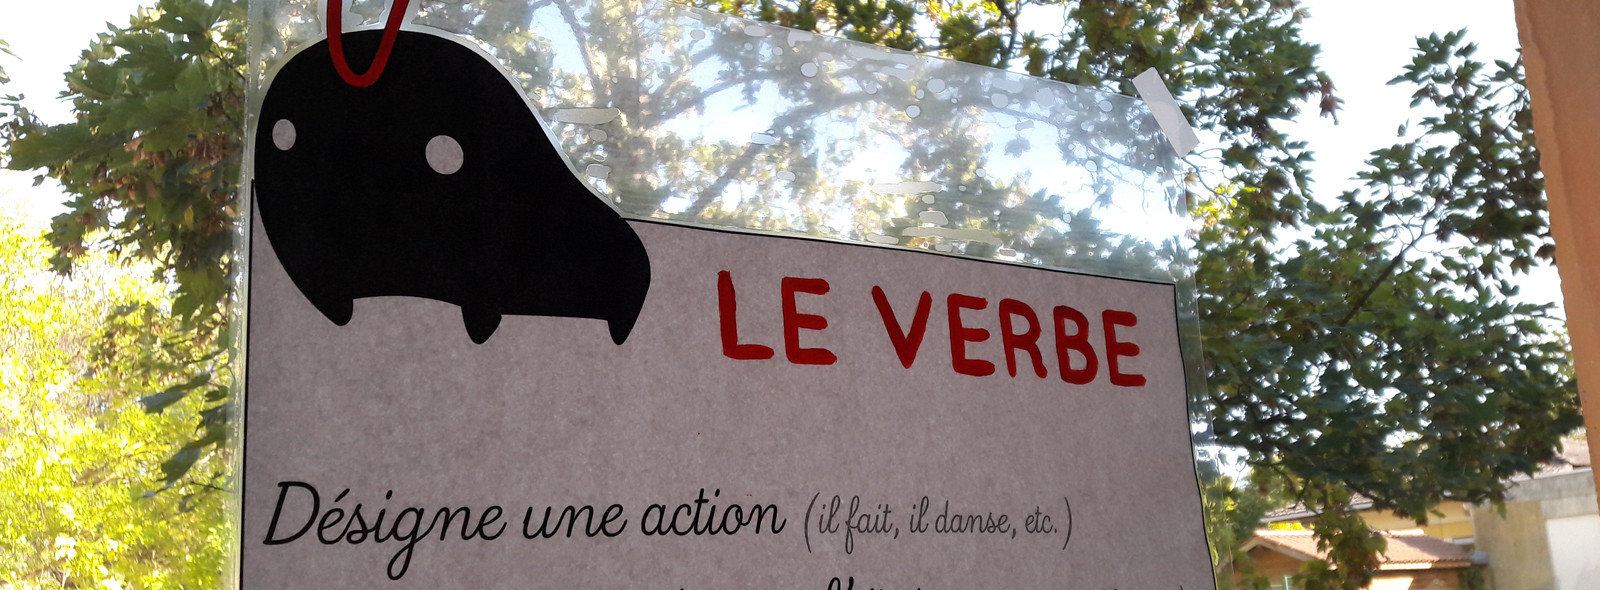 Affichage du verbe